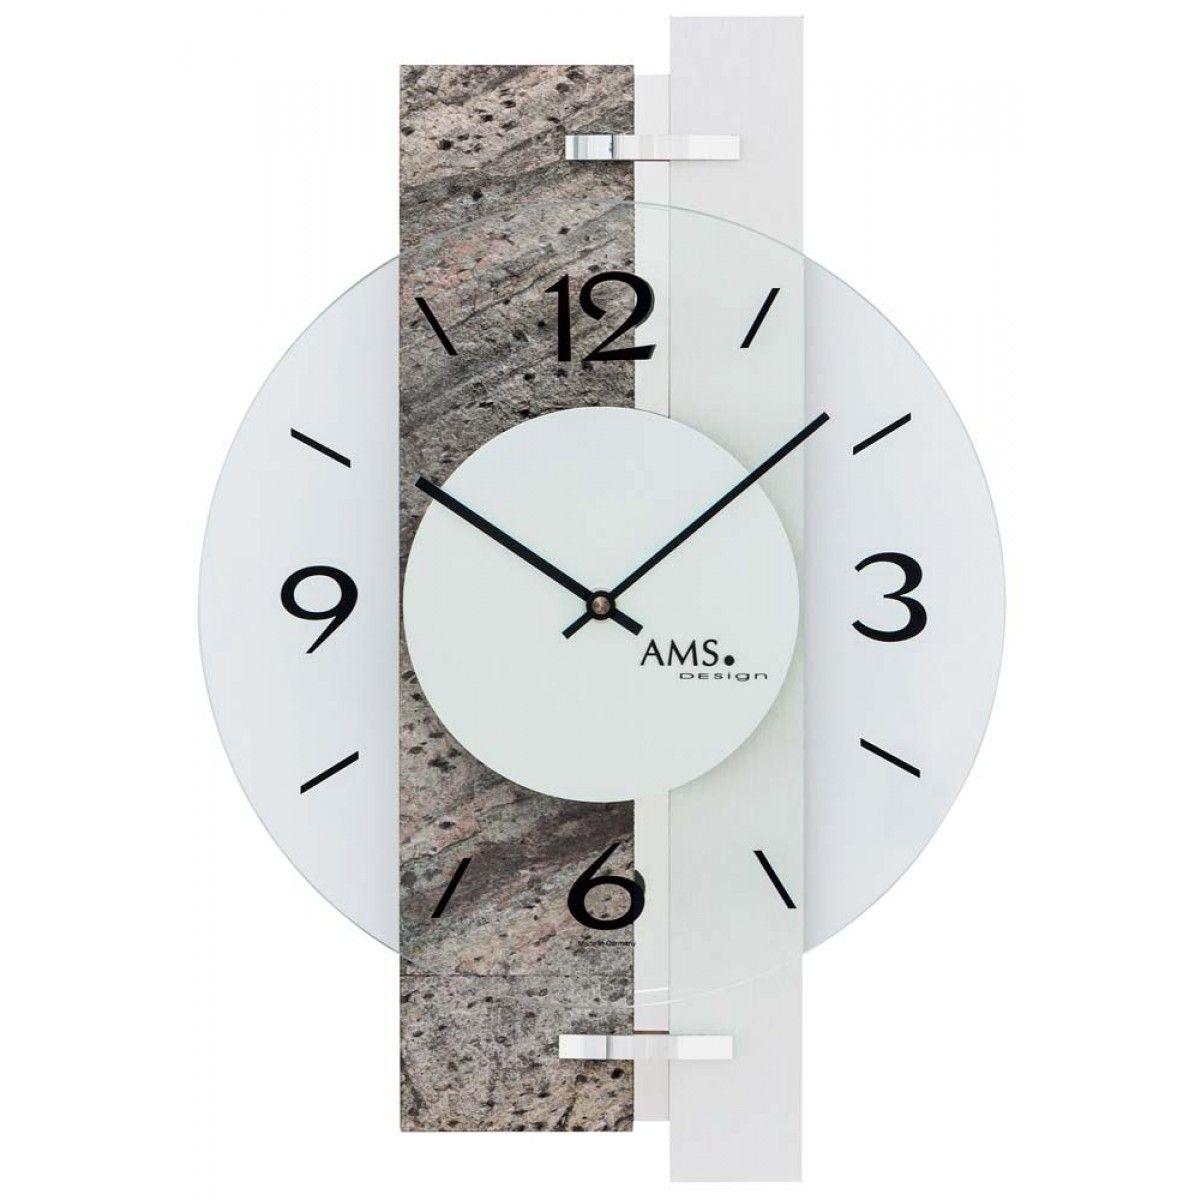 AMS wandklok 9558 Moderne klokken Clock, Wall clock, Desio